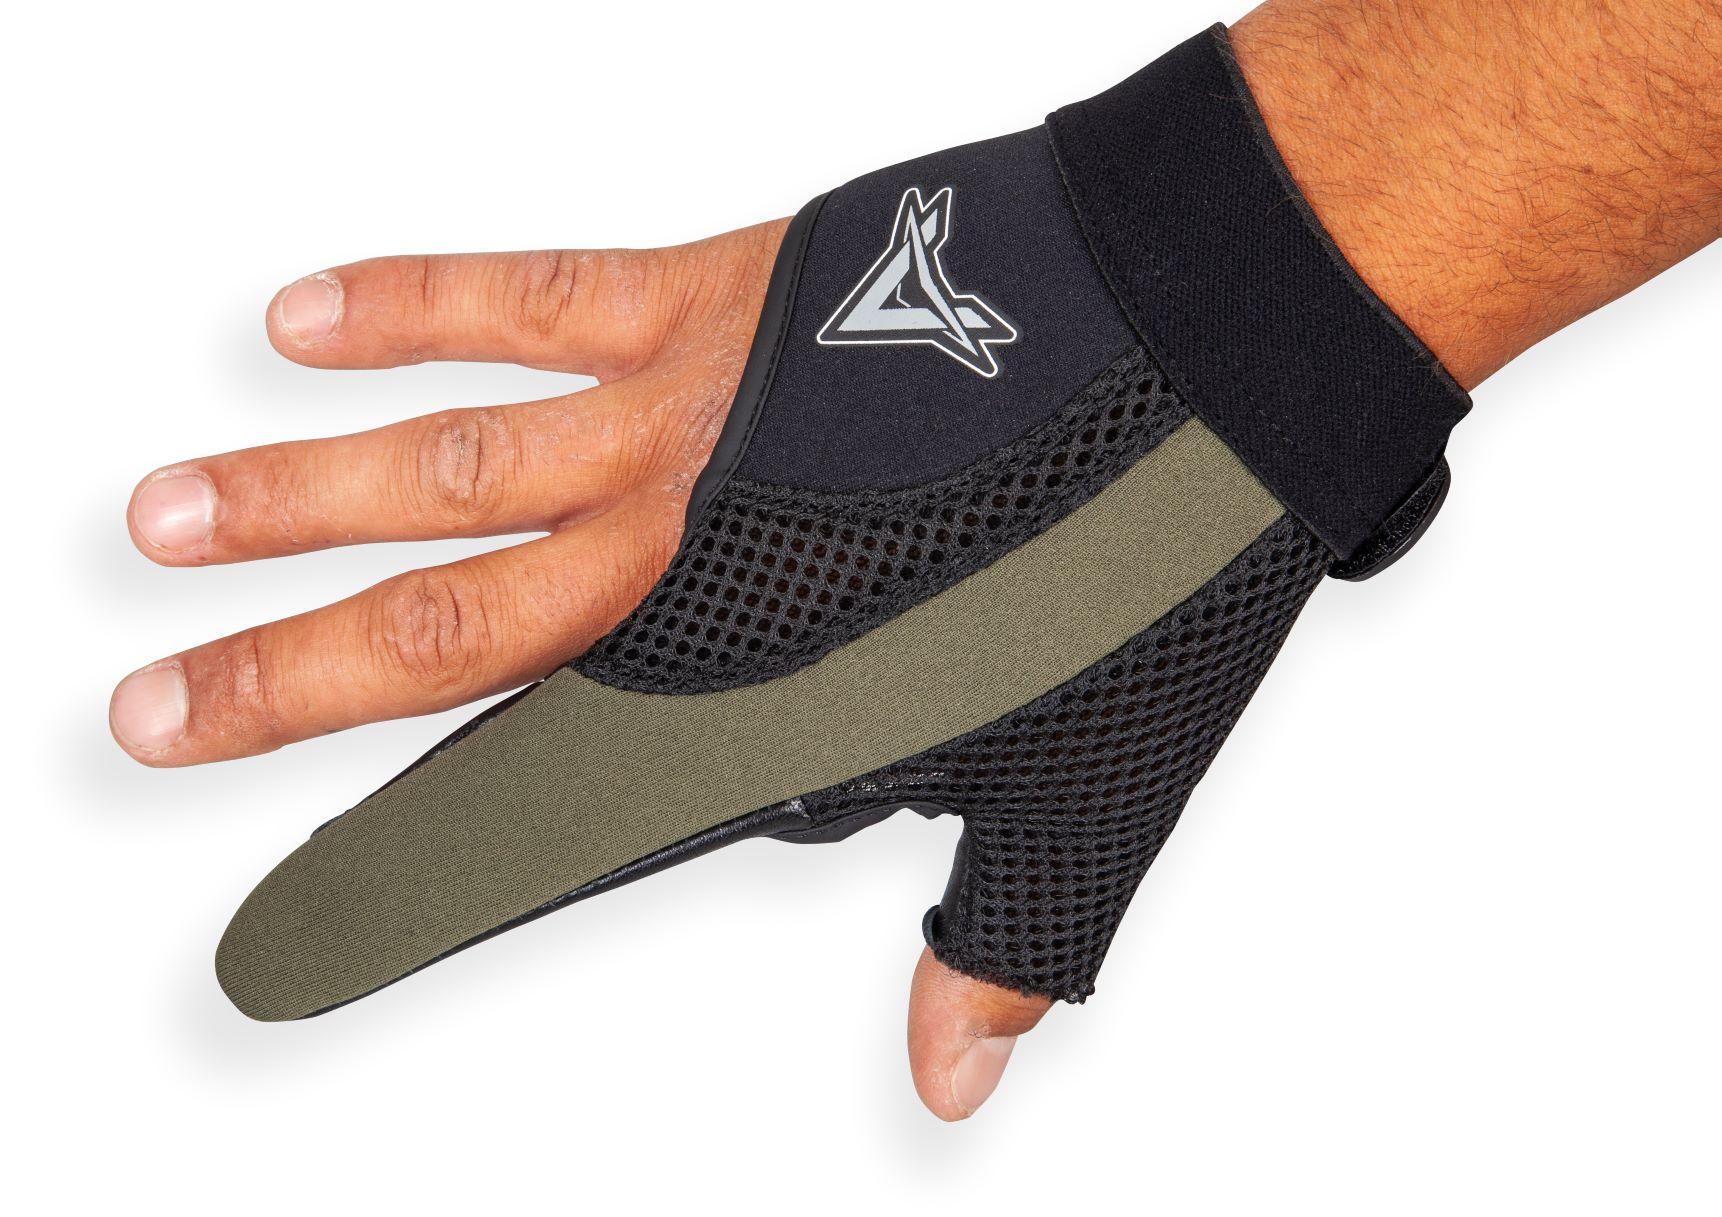 Anaconda rukavice Profi Casting Glove, pravá, vel. M